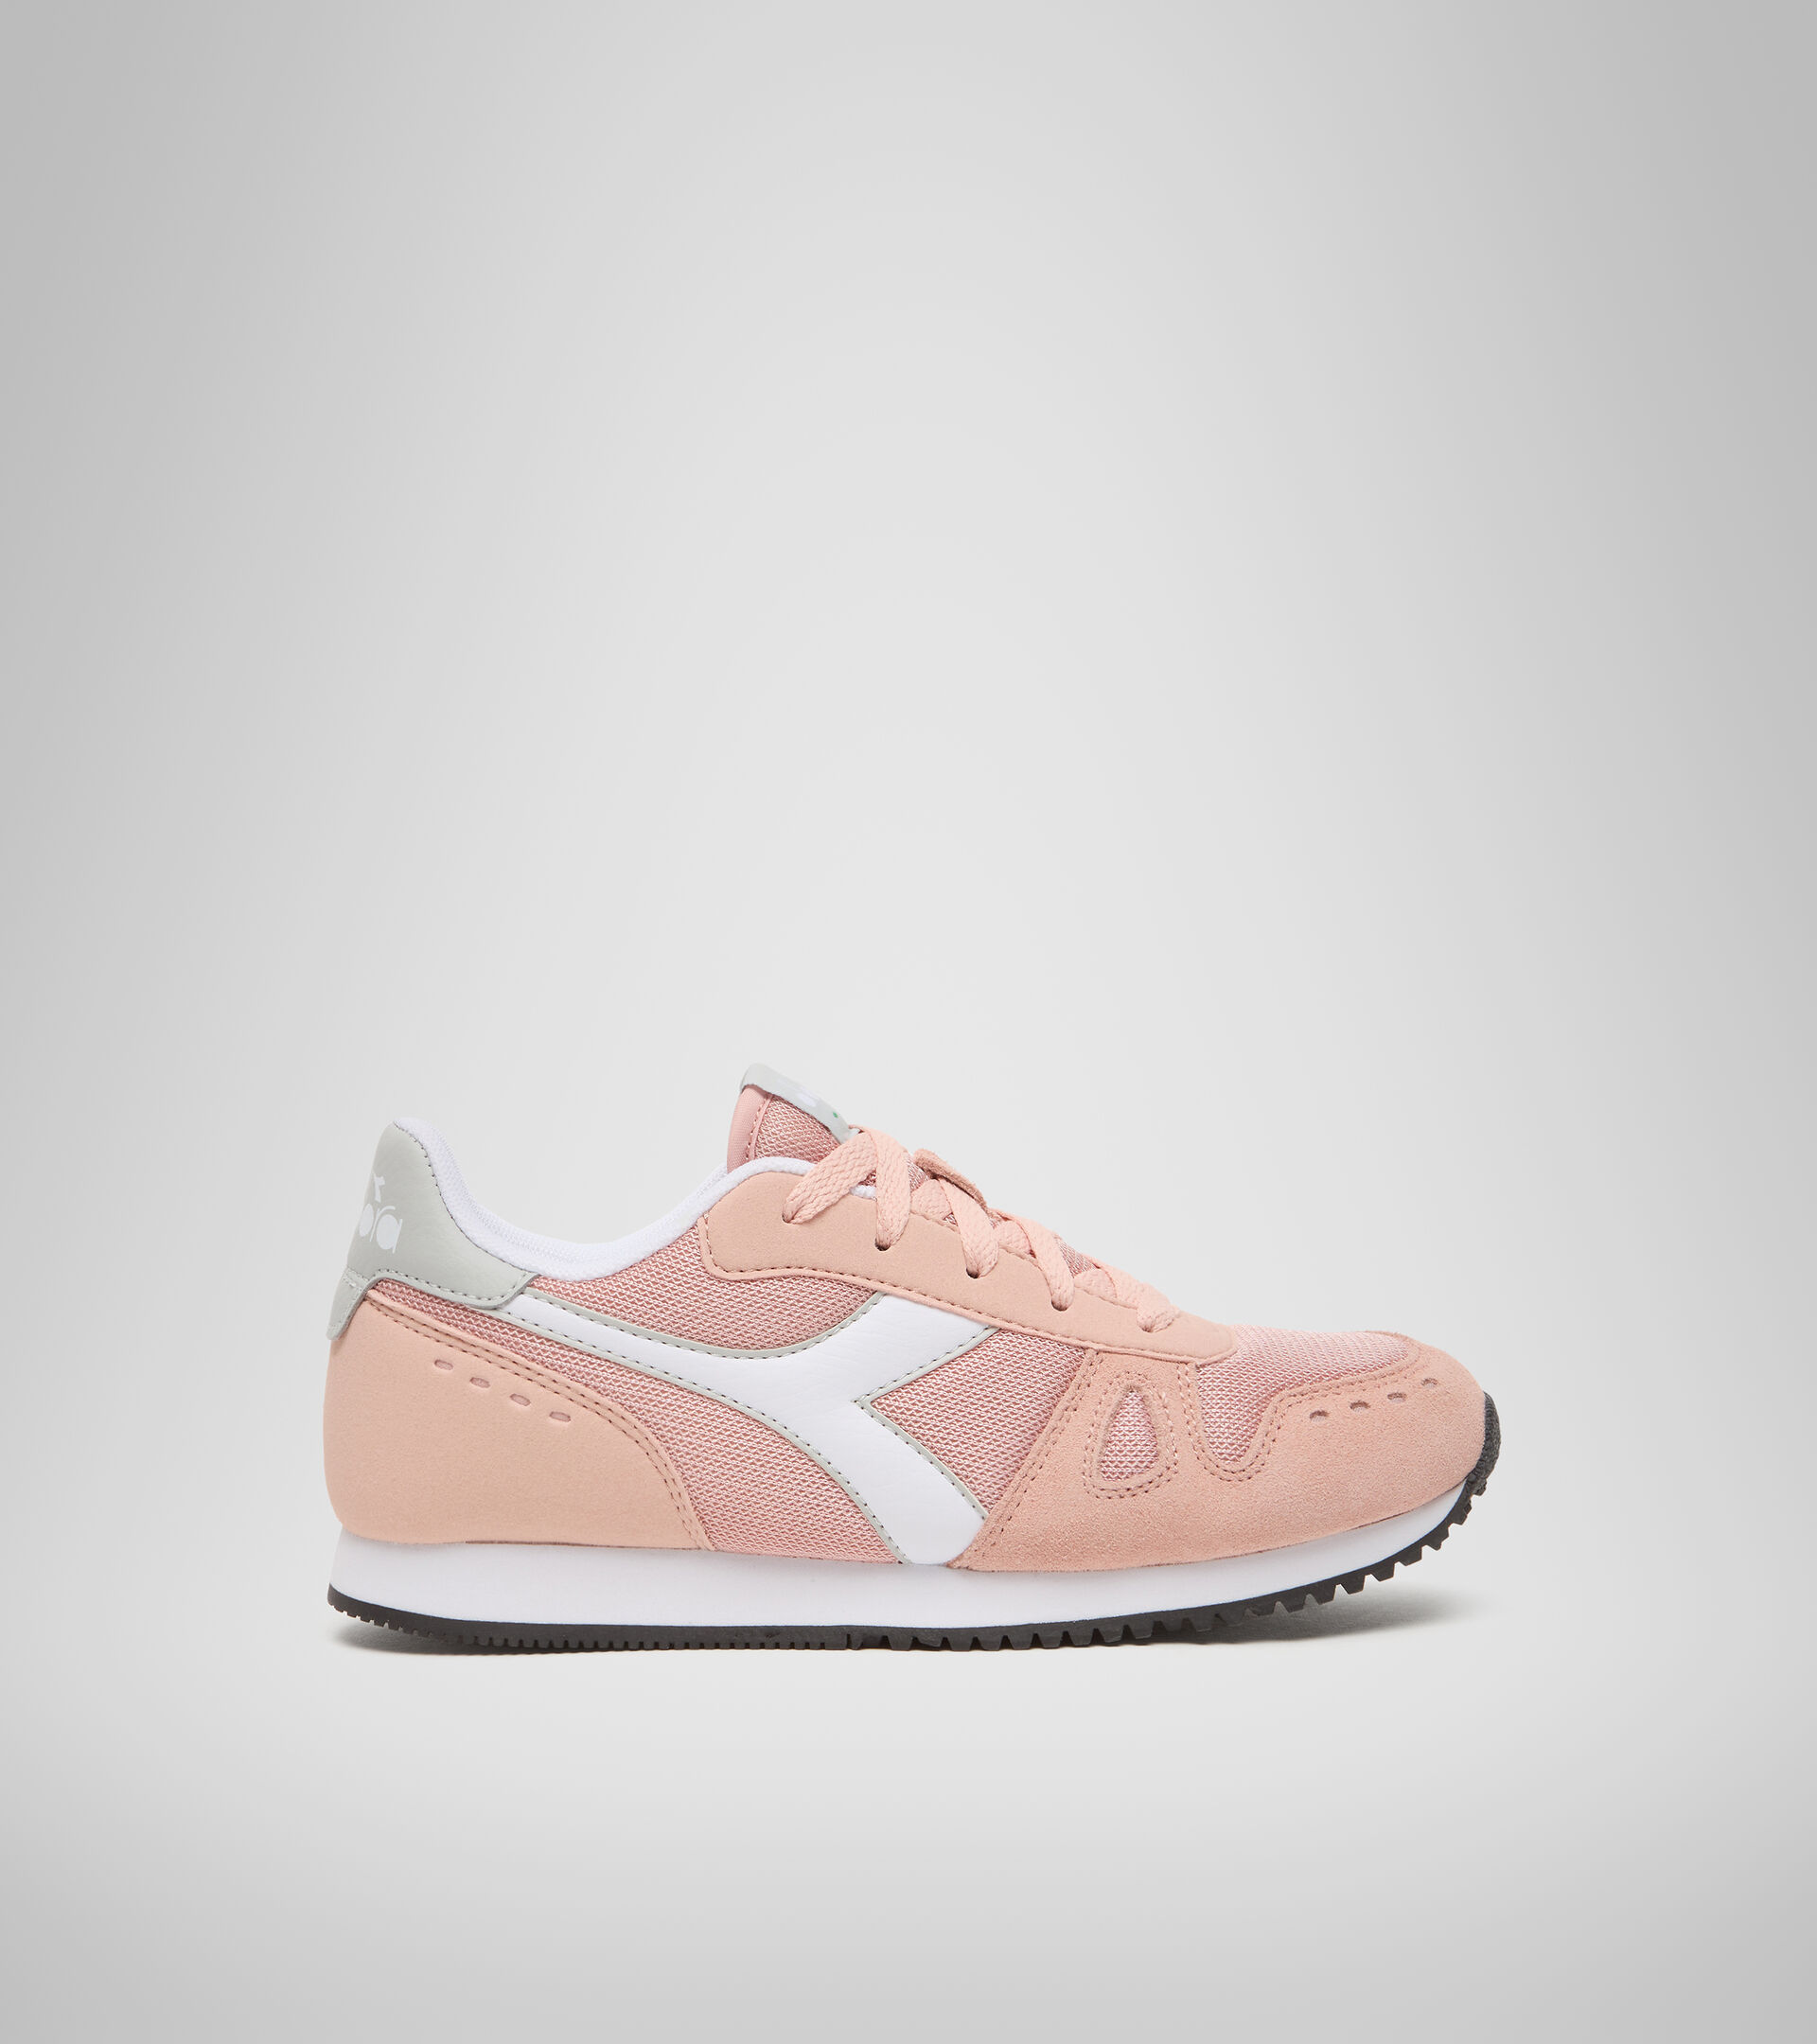 Footwear Sport BAMBINO SIMPLE RUN GS SOL DE NOCHE Diadora